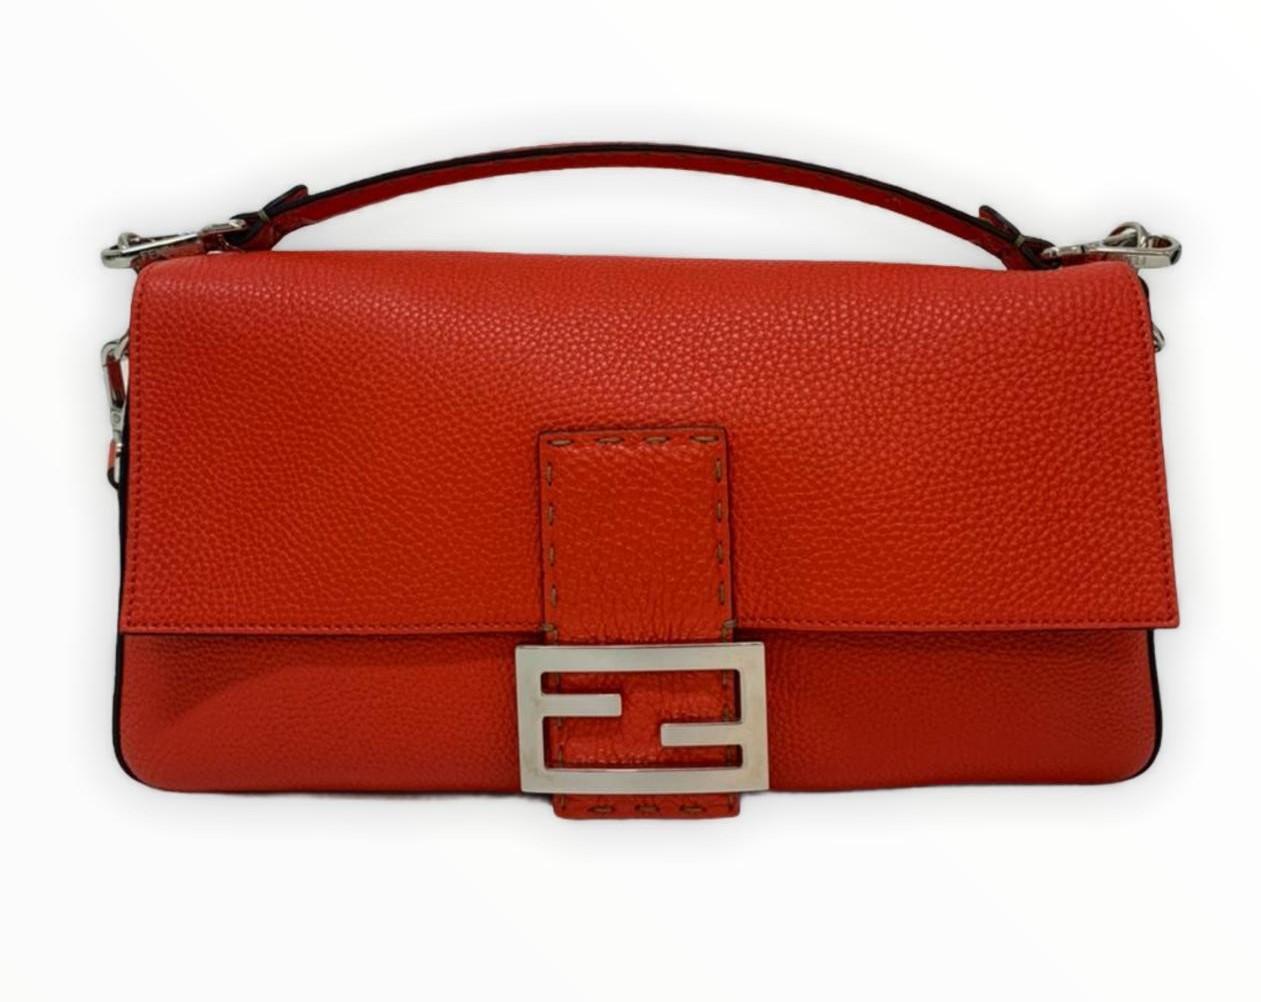 Bolsa Fendi Baguette